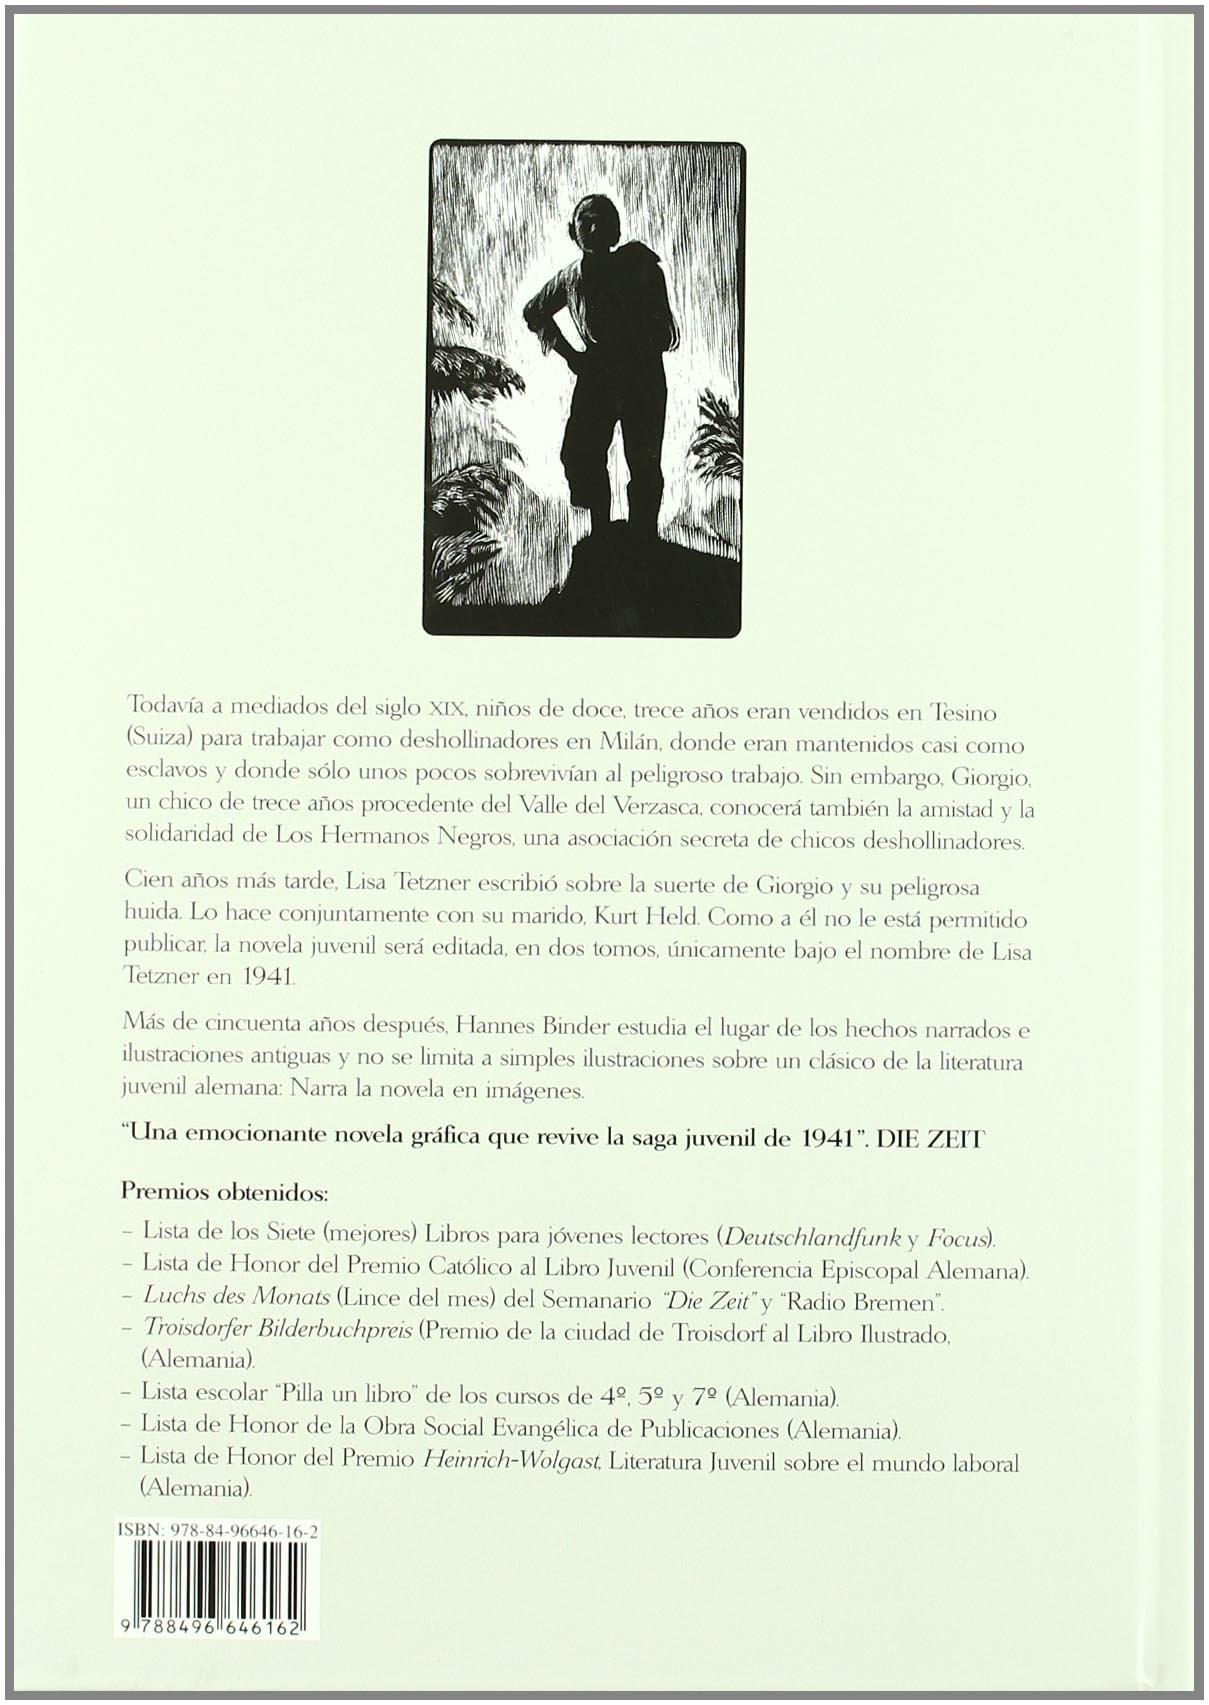 Los Hermanos Negros/ The Black Brothers: Novela Grafica (Spanish Edition): Hannes Binder, Lisa Tetzner: 9788496646162: Amazon.com: Books